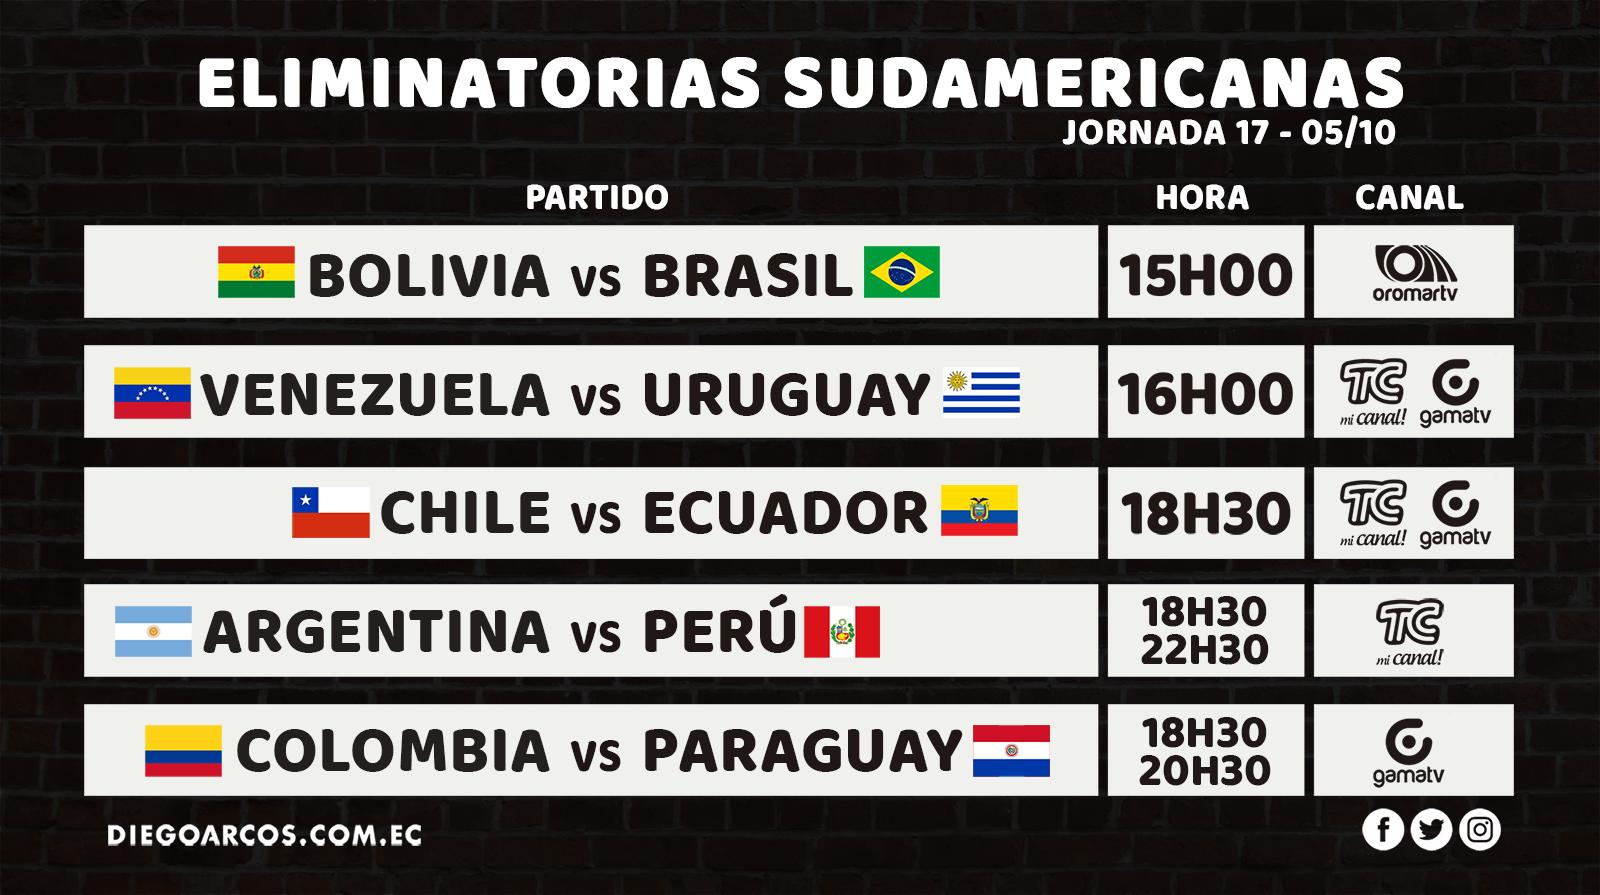 Quien transmite jornada 17 eliminatorias sudamericanas